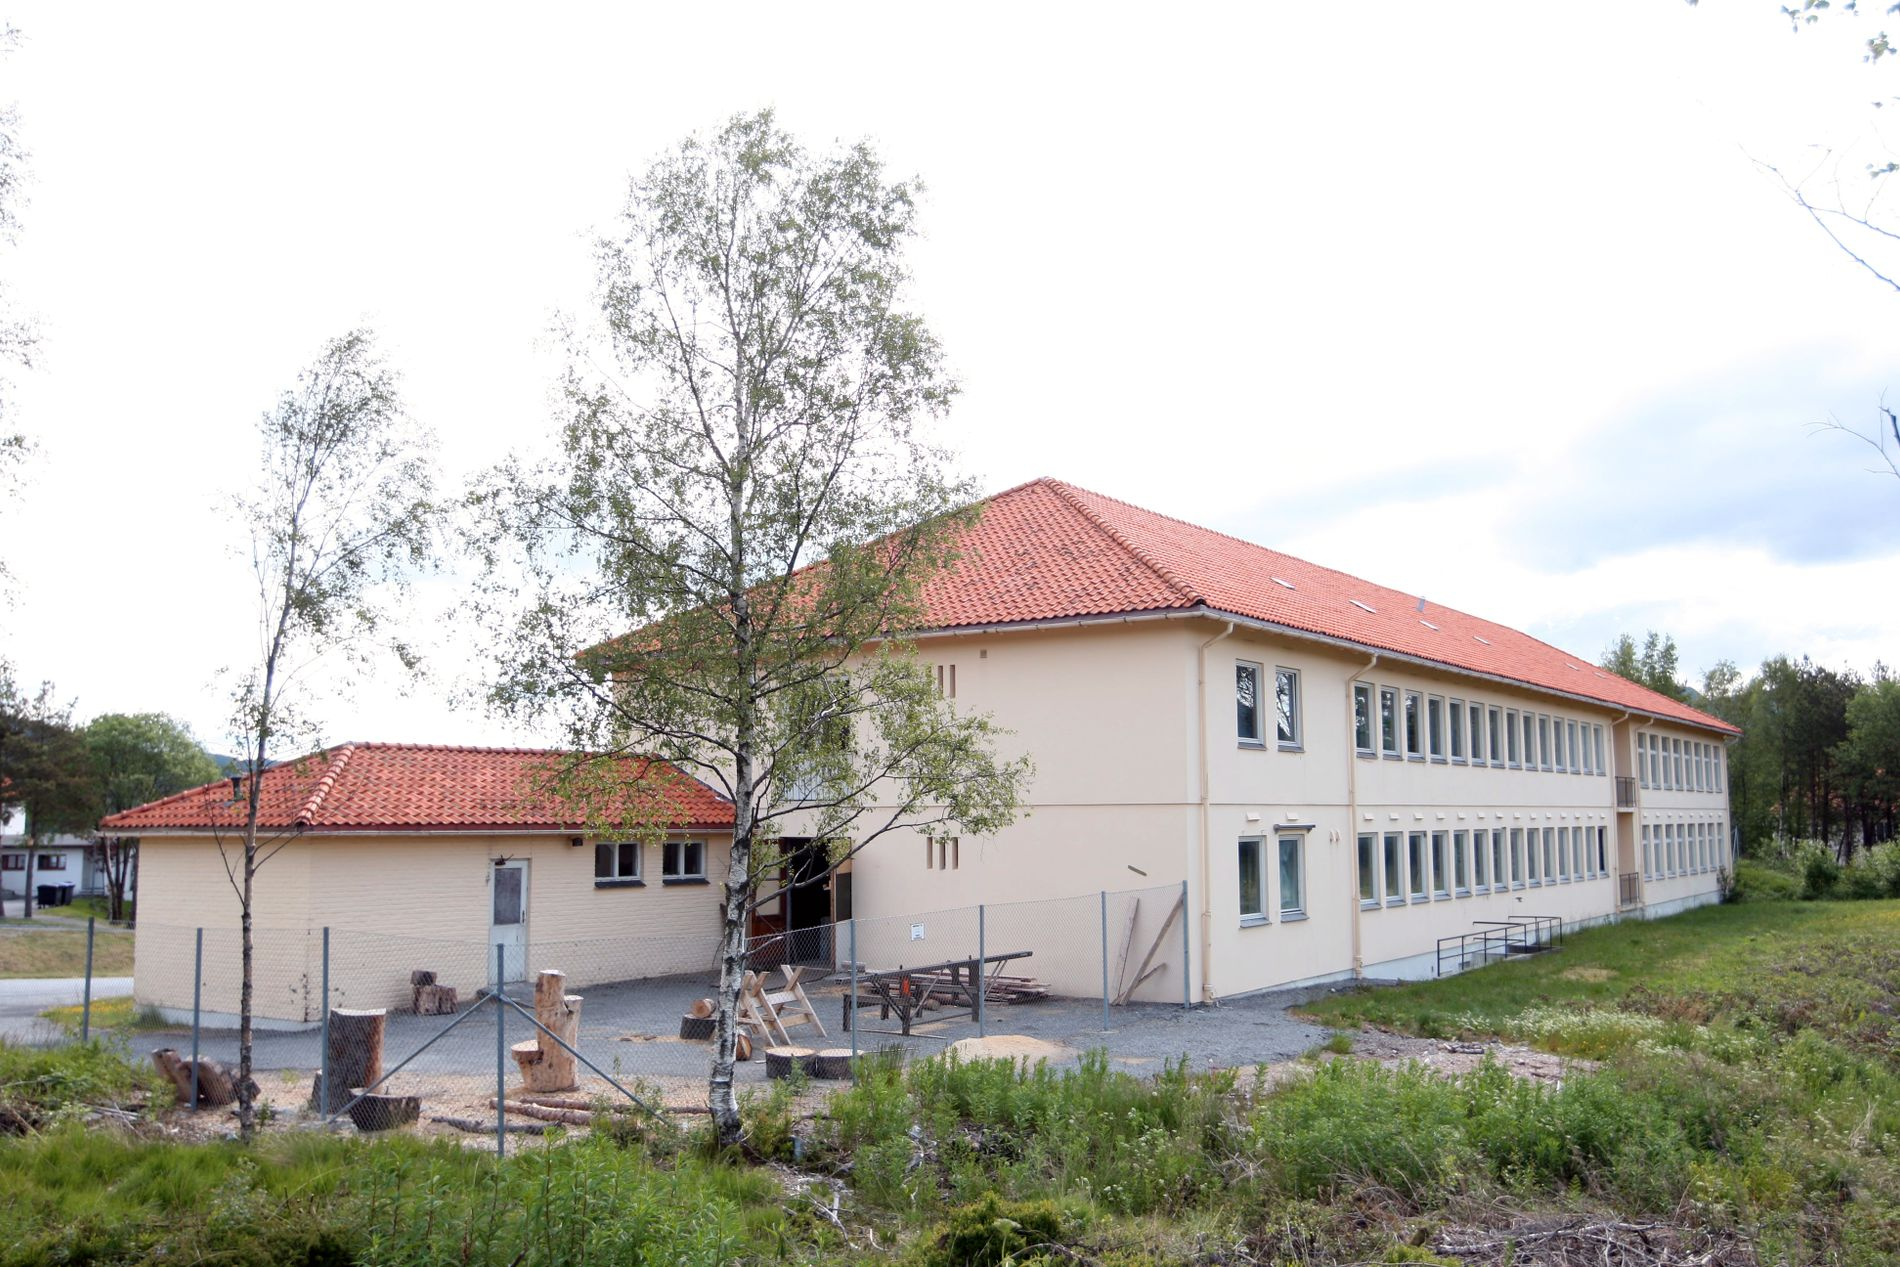 UNGDOMSAVDELING: Her er lokalene til den spesialdesignede fengselsavdelingen for barn og ungdom ved Bjørgvin Fengsel.